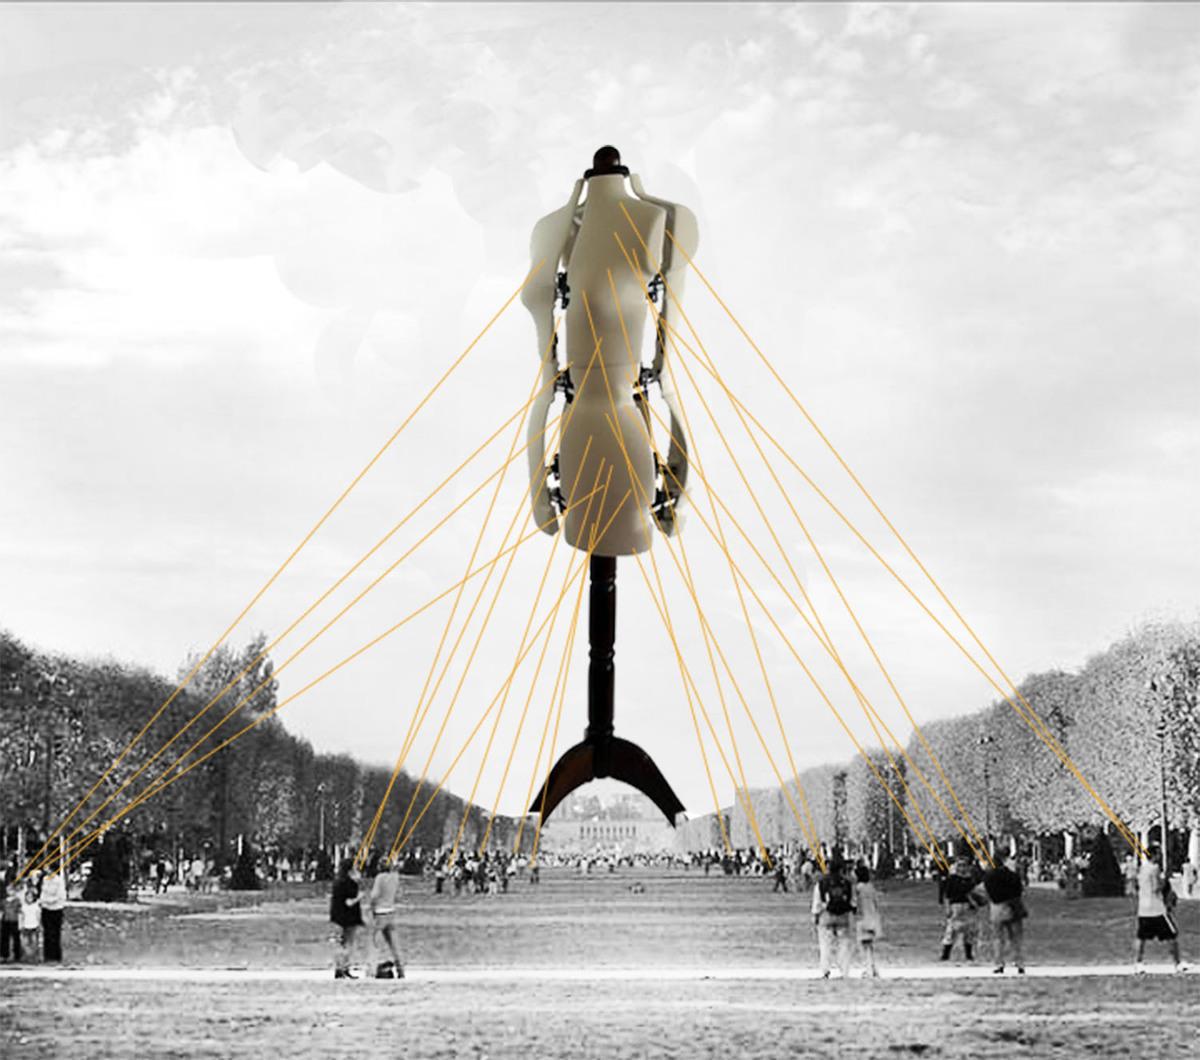 Corporal Eiffel Tower: